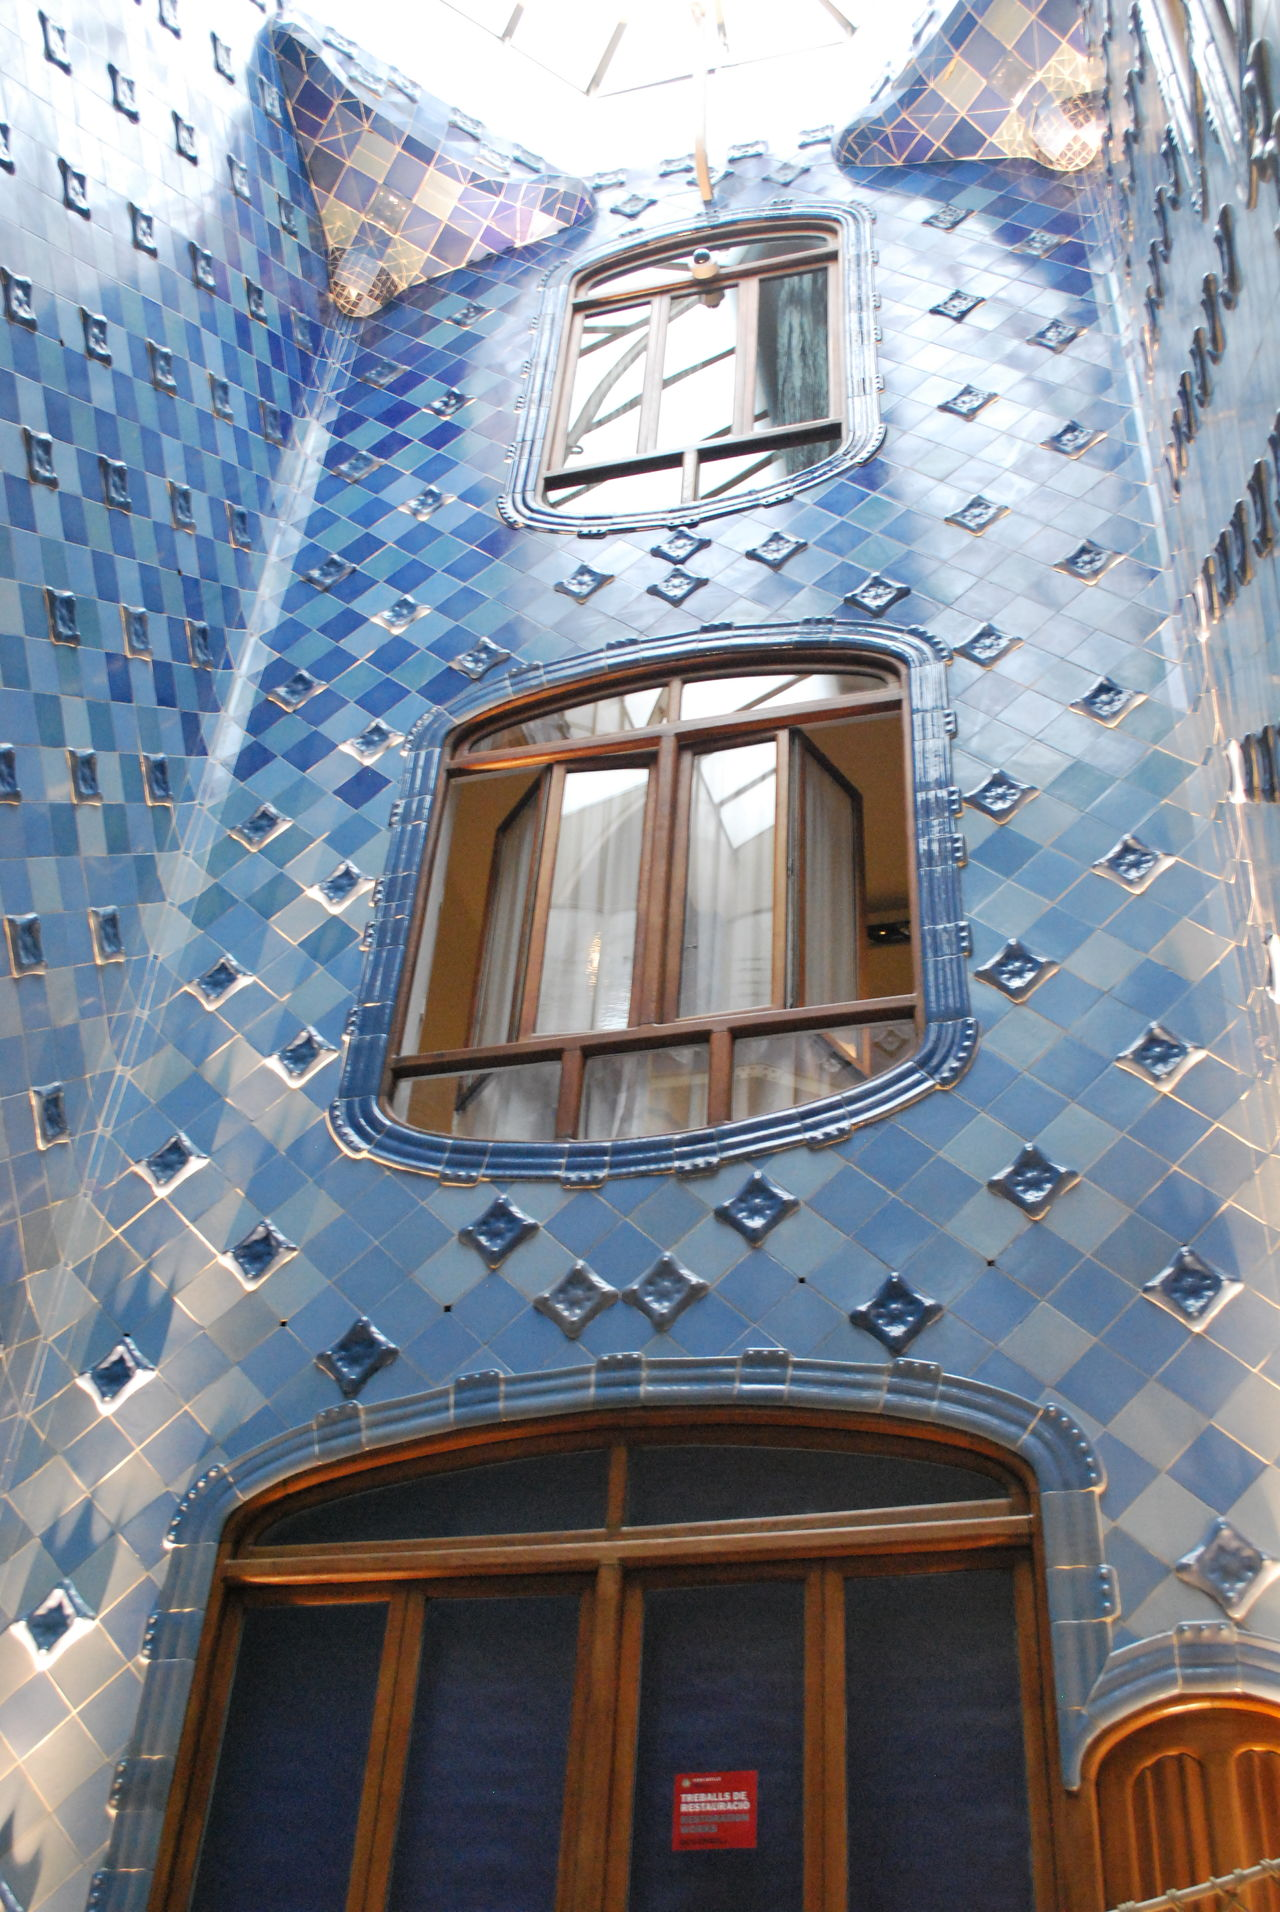 Architecture Barcelona Barcelona, Spain Blue Building Exterior Built Structure Casa Batllo Casa Batllo. Gaudi Catalonia Catalunya Day Gaudi Inside Low Angle View No People Outdoors SPAIN Window